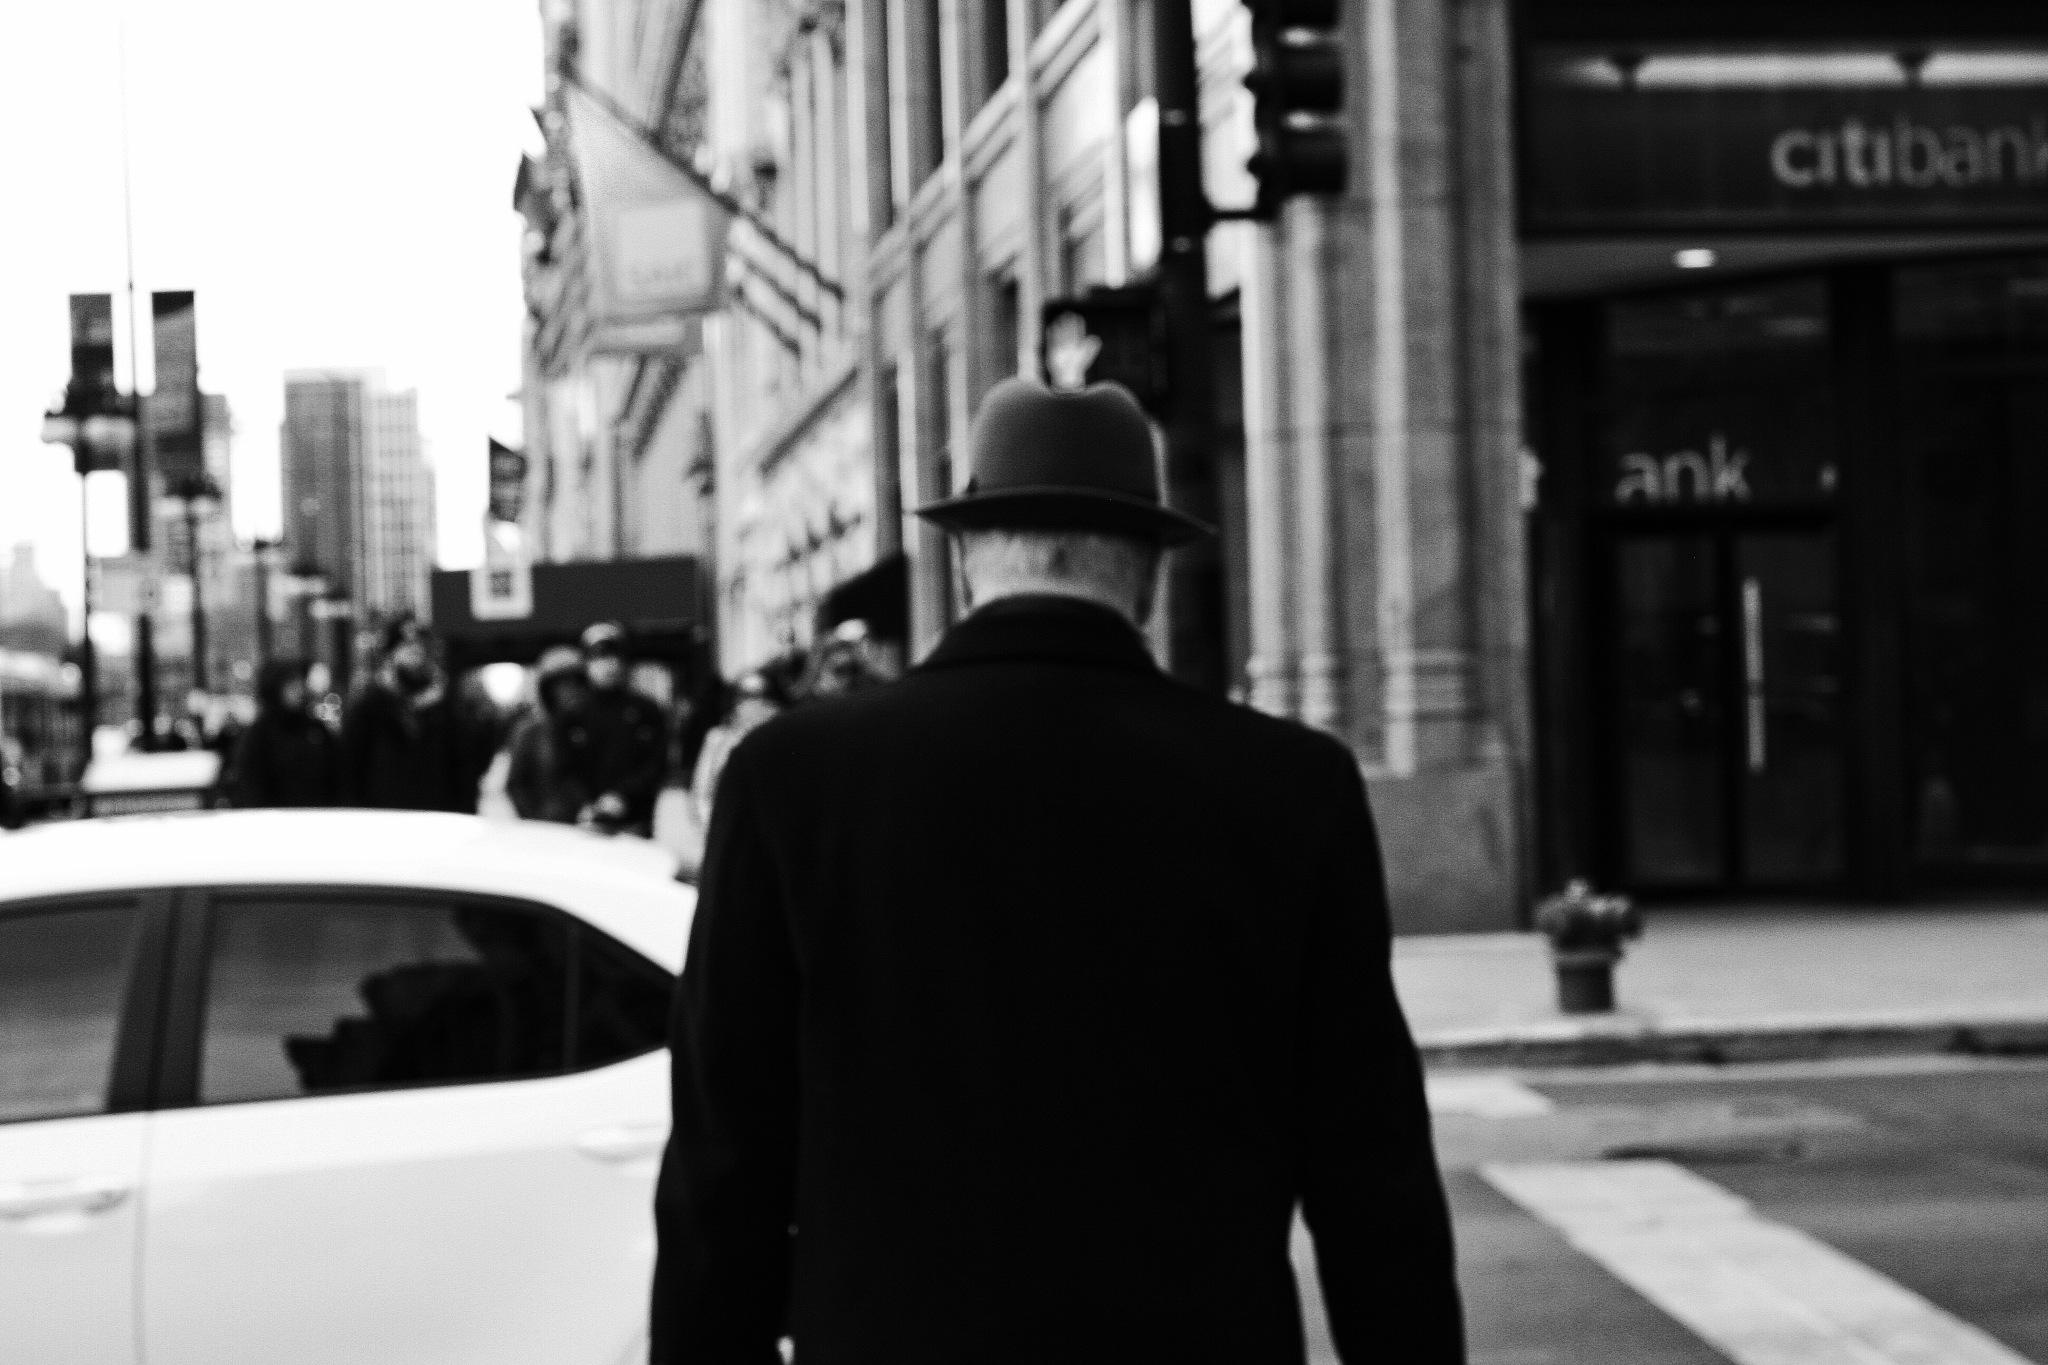 A walk down Chicago's streets by Barrett Bear Baker